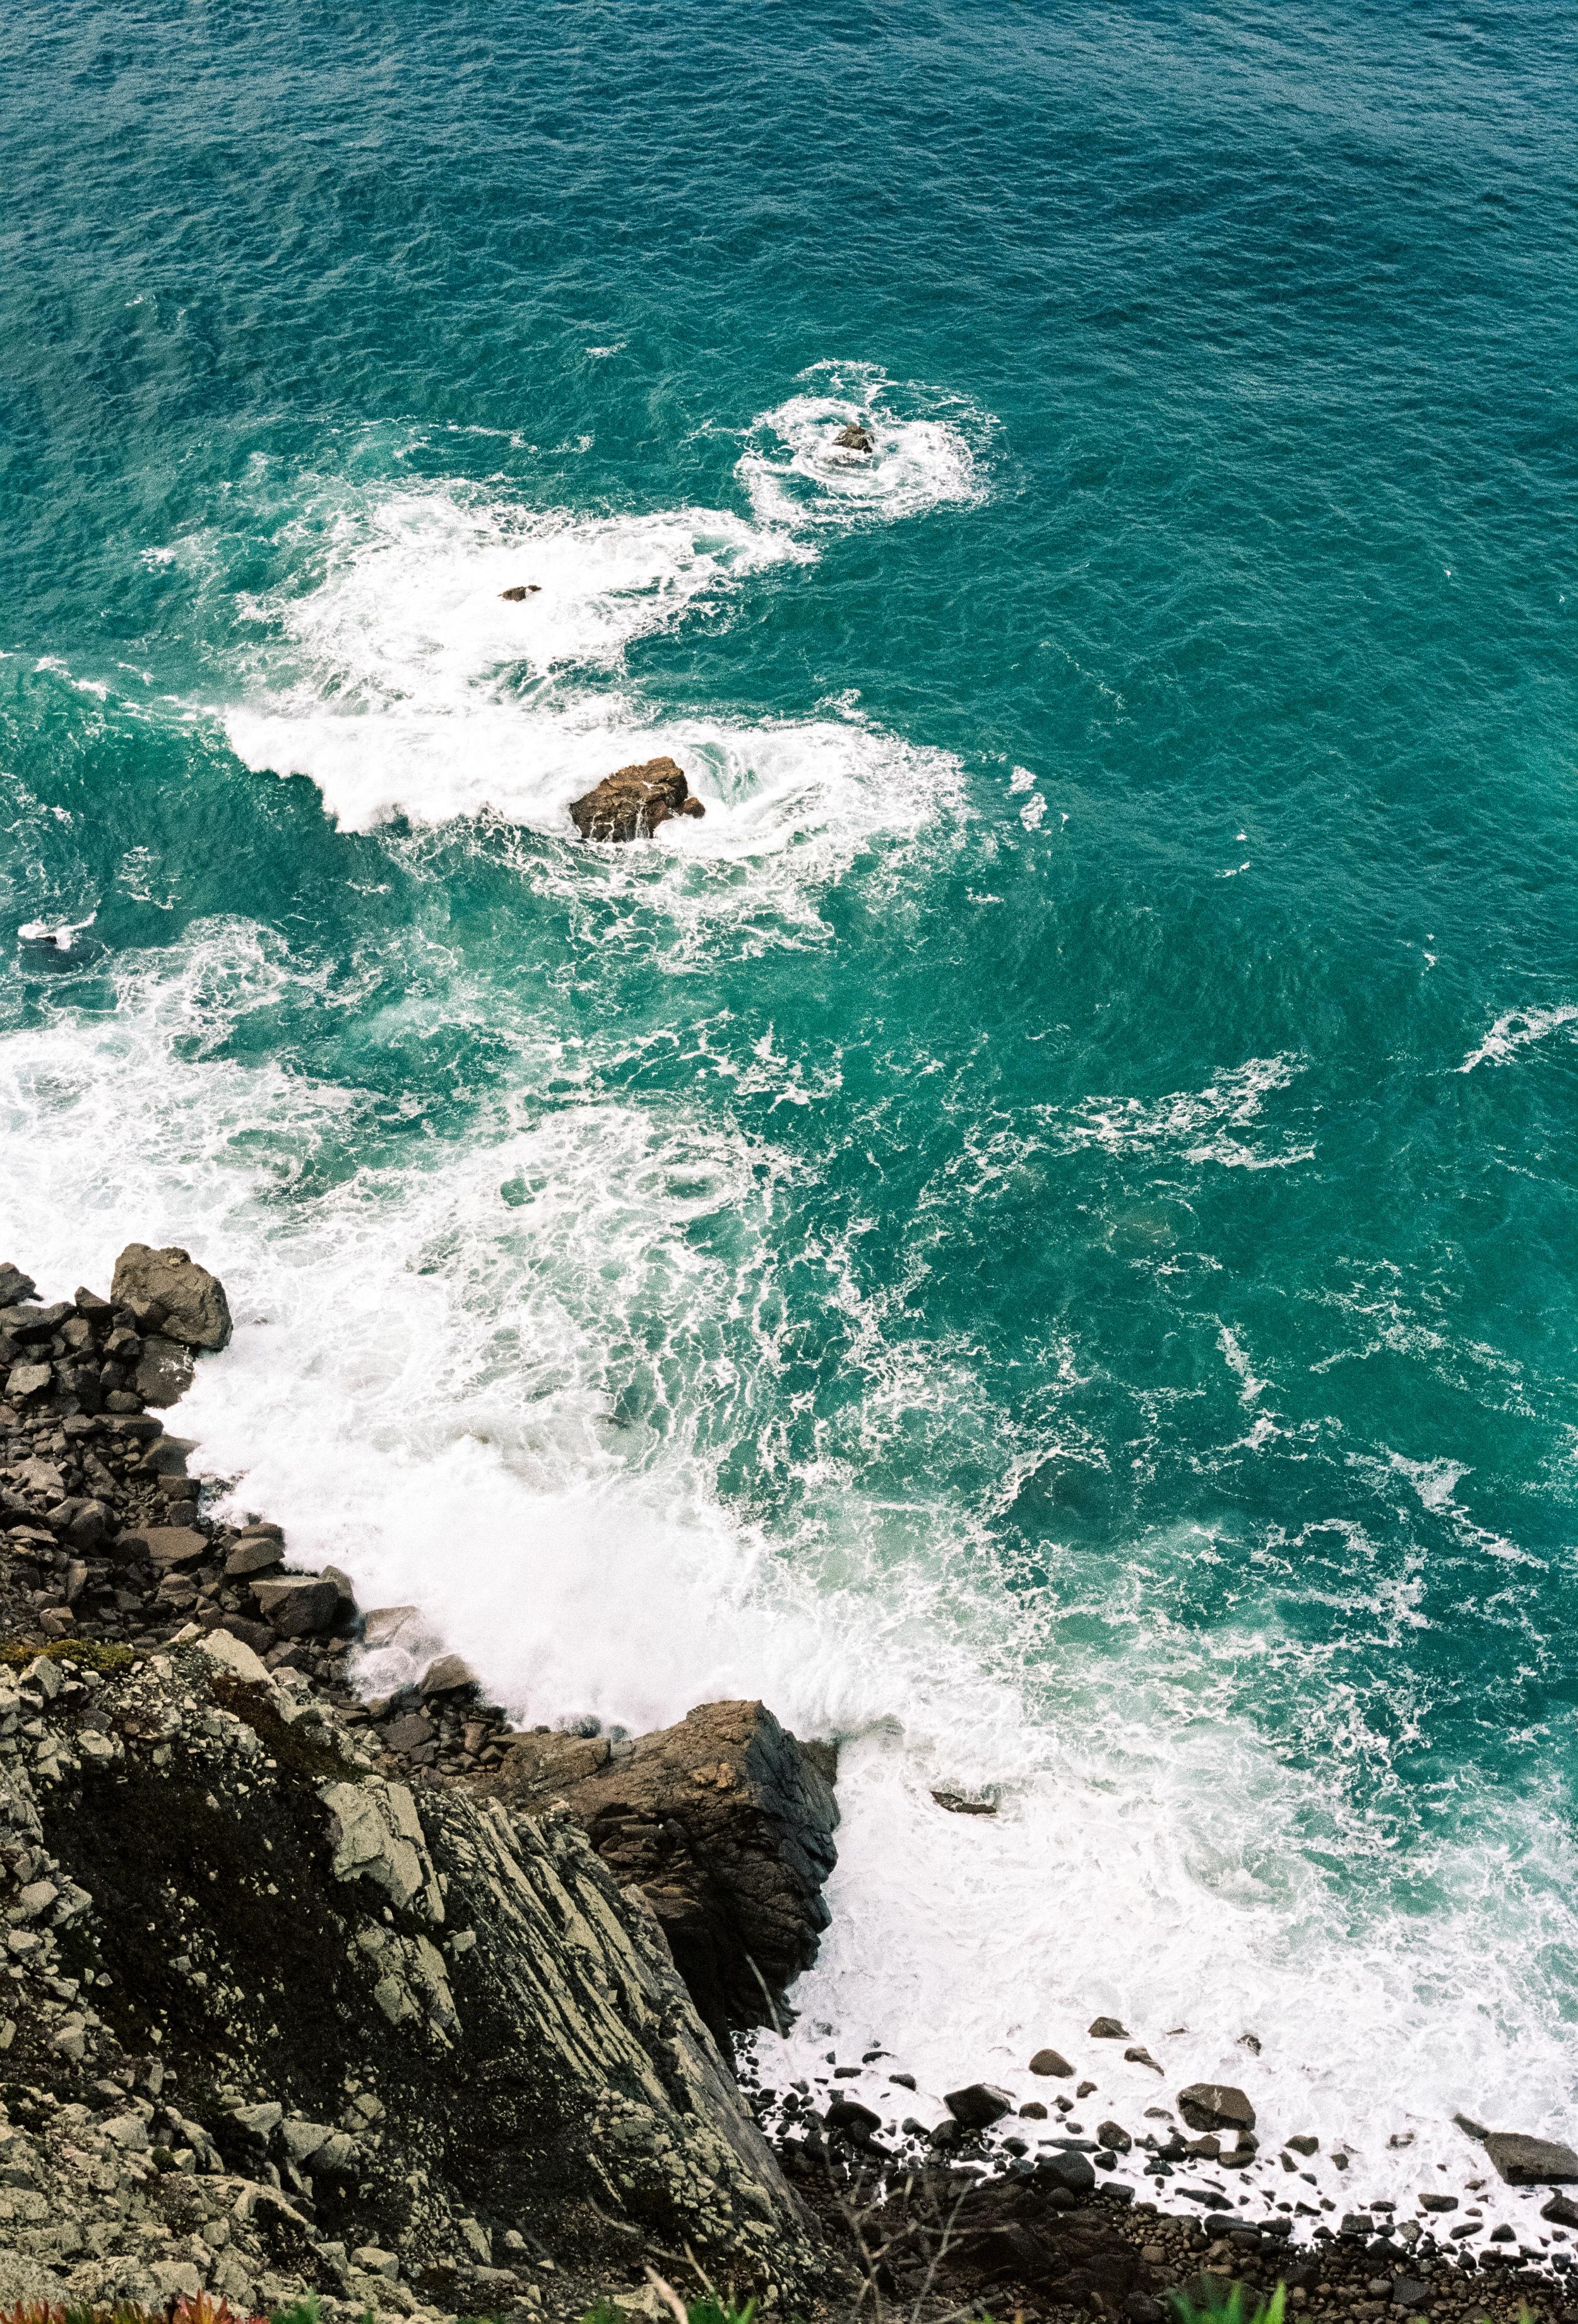 Cabo da Roca Christopher Parschat 4